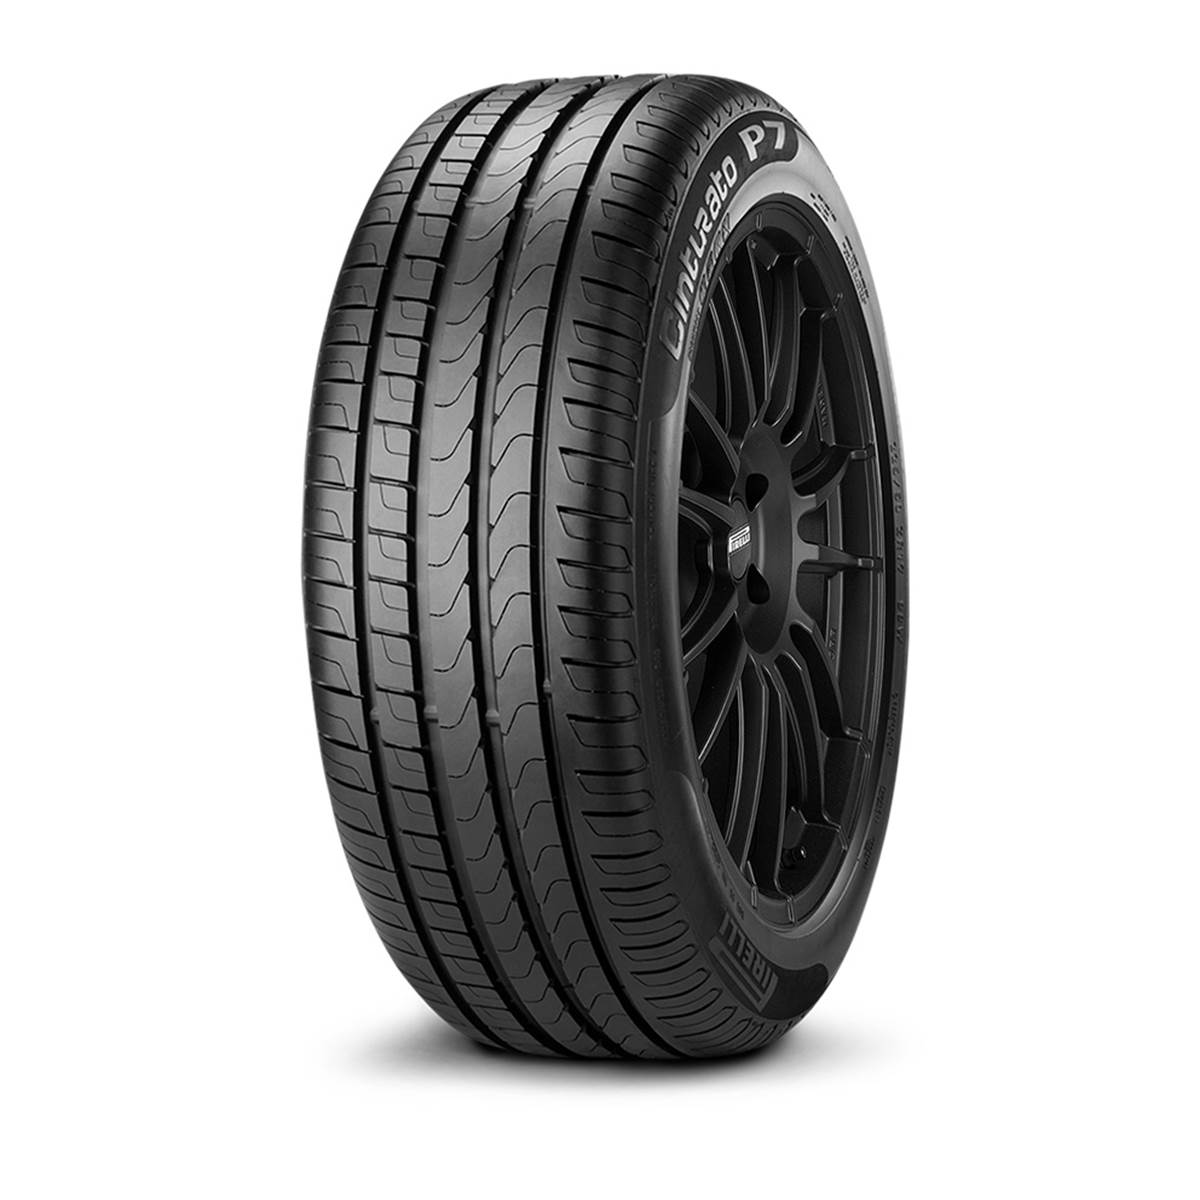 Pneu Runflat Pirelli 245/40R18 97Y Cinturato P7 XL